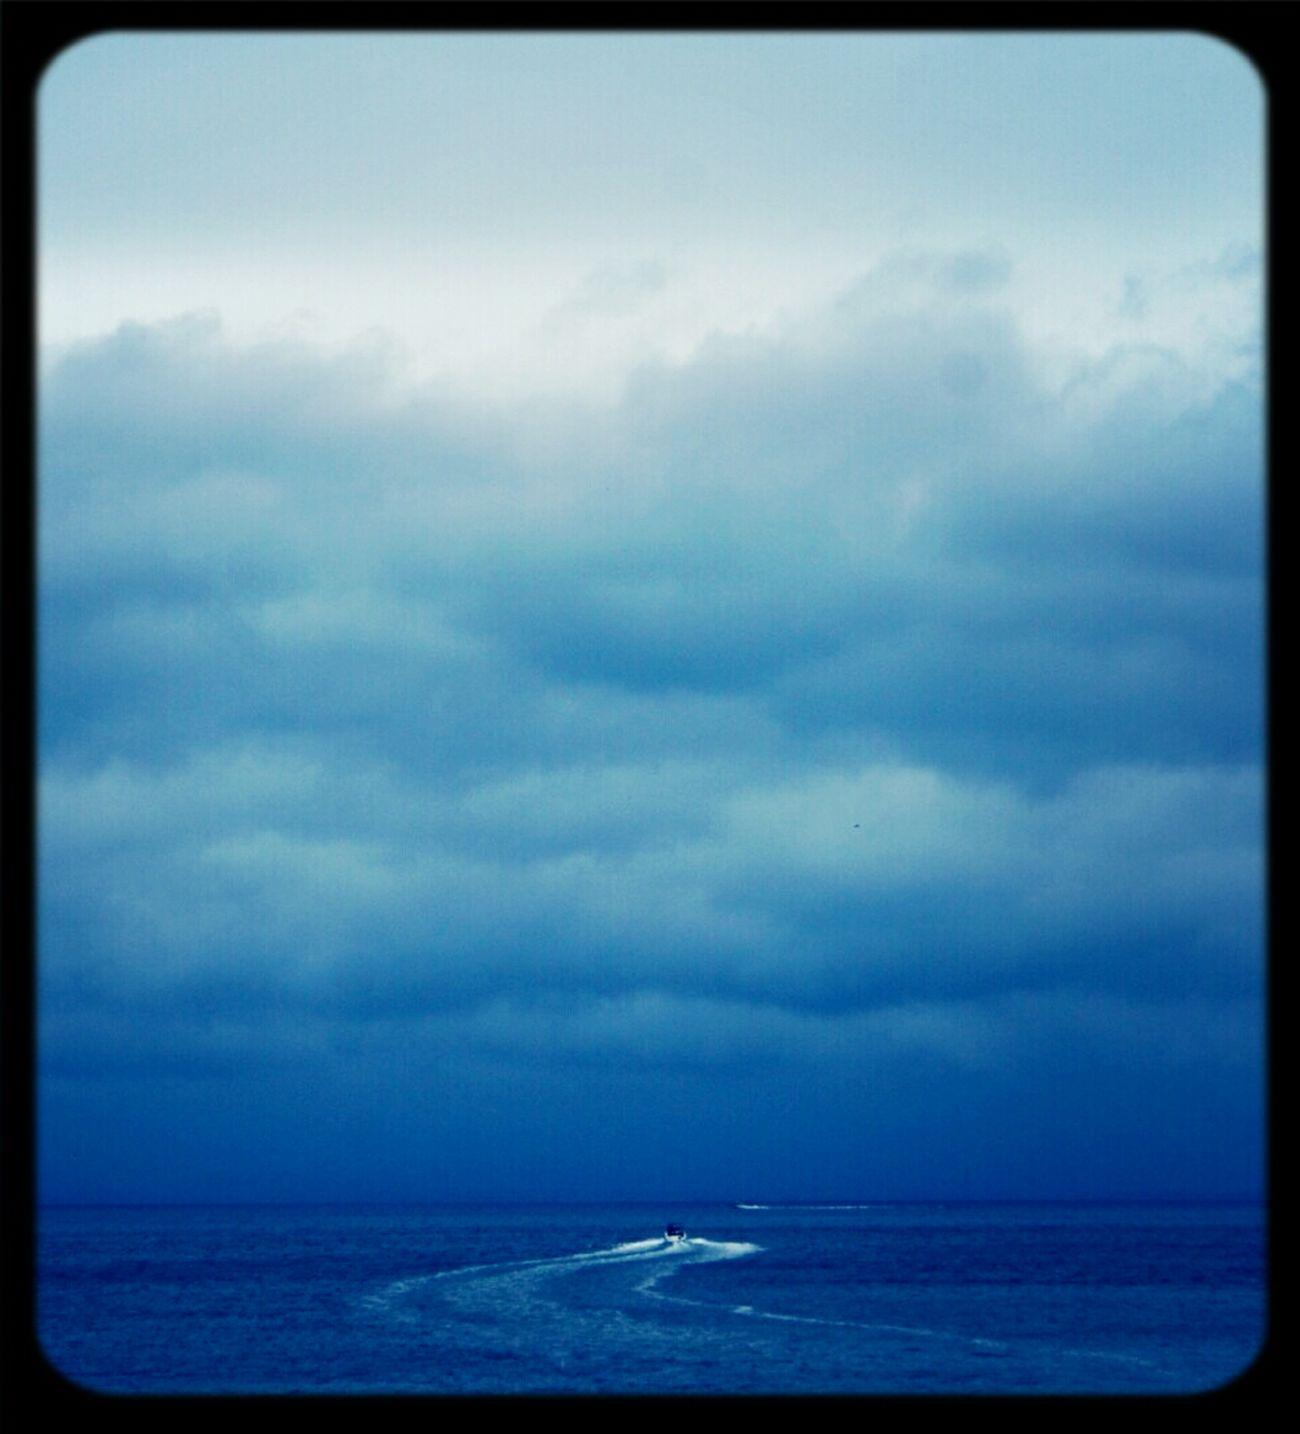 Sea And Sky Sea Shtorm Boat Море шторм приморье лодка катер